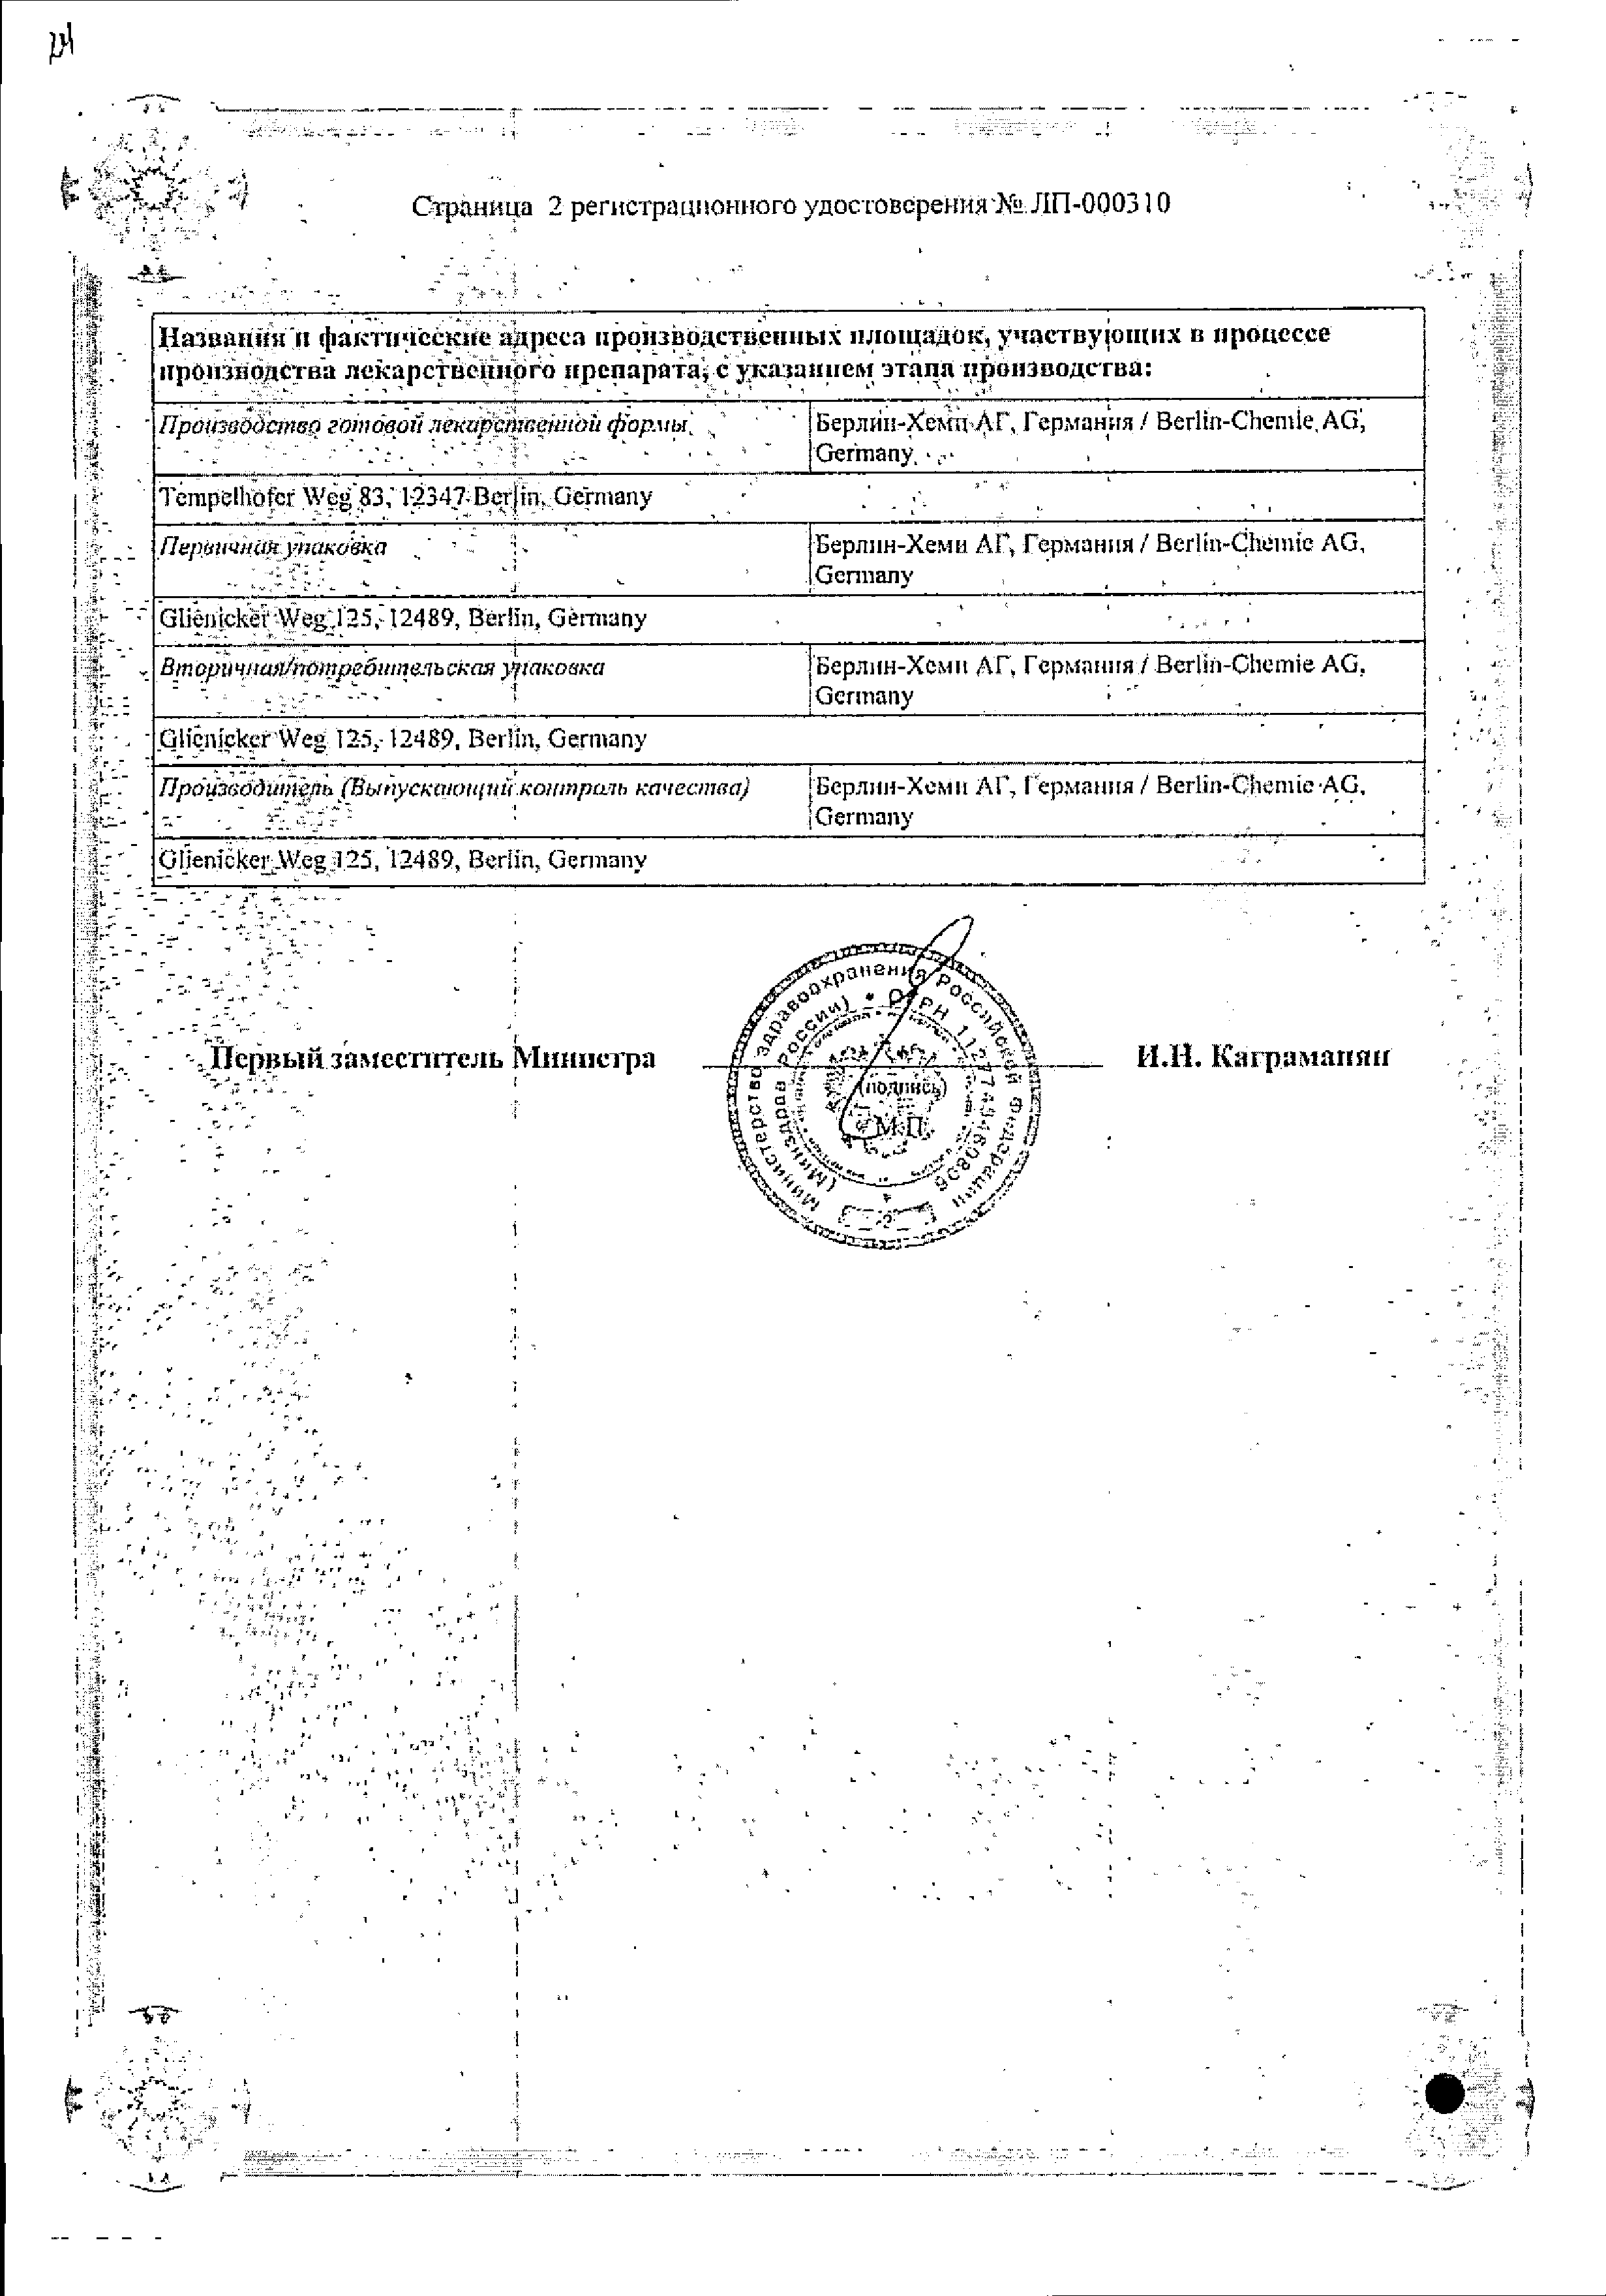 Берлиприл плюс сертификат